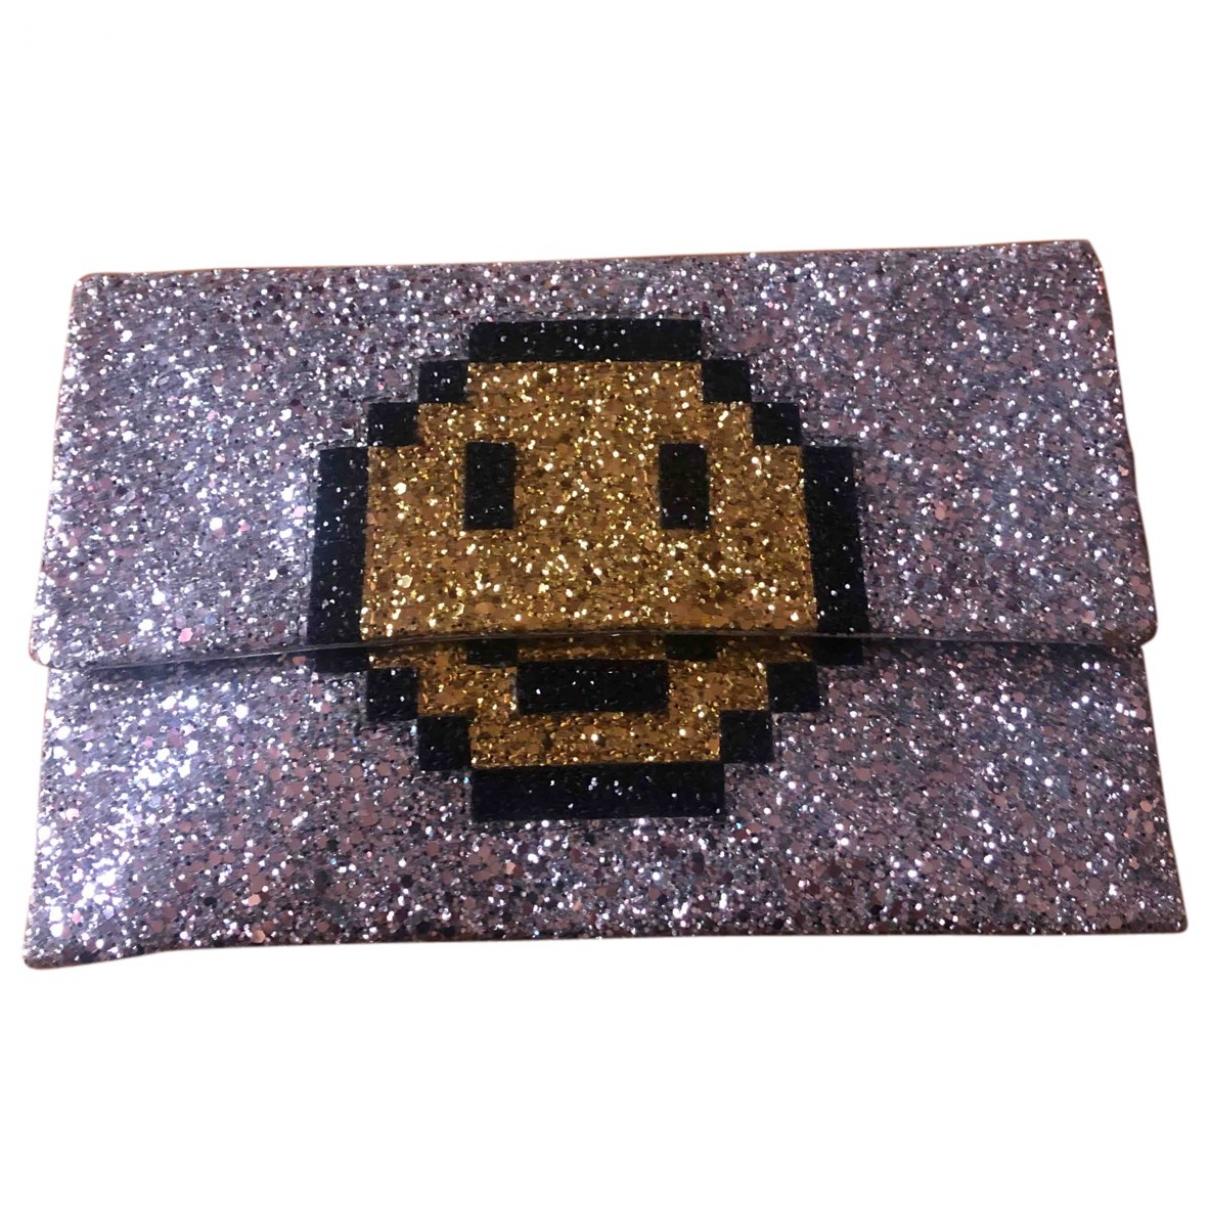 Anya Hindmarch \N Silver Glitter Clutch bag for Women \N